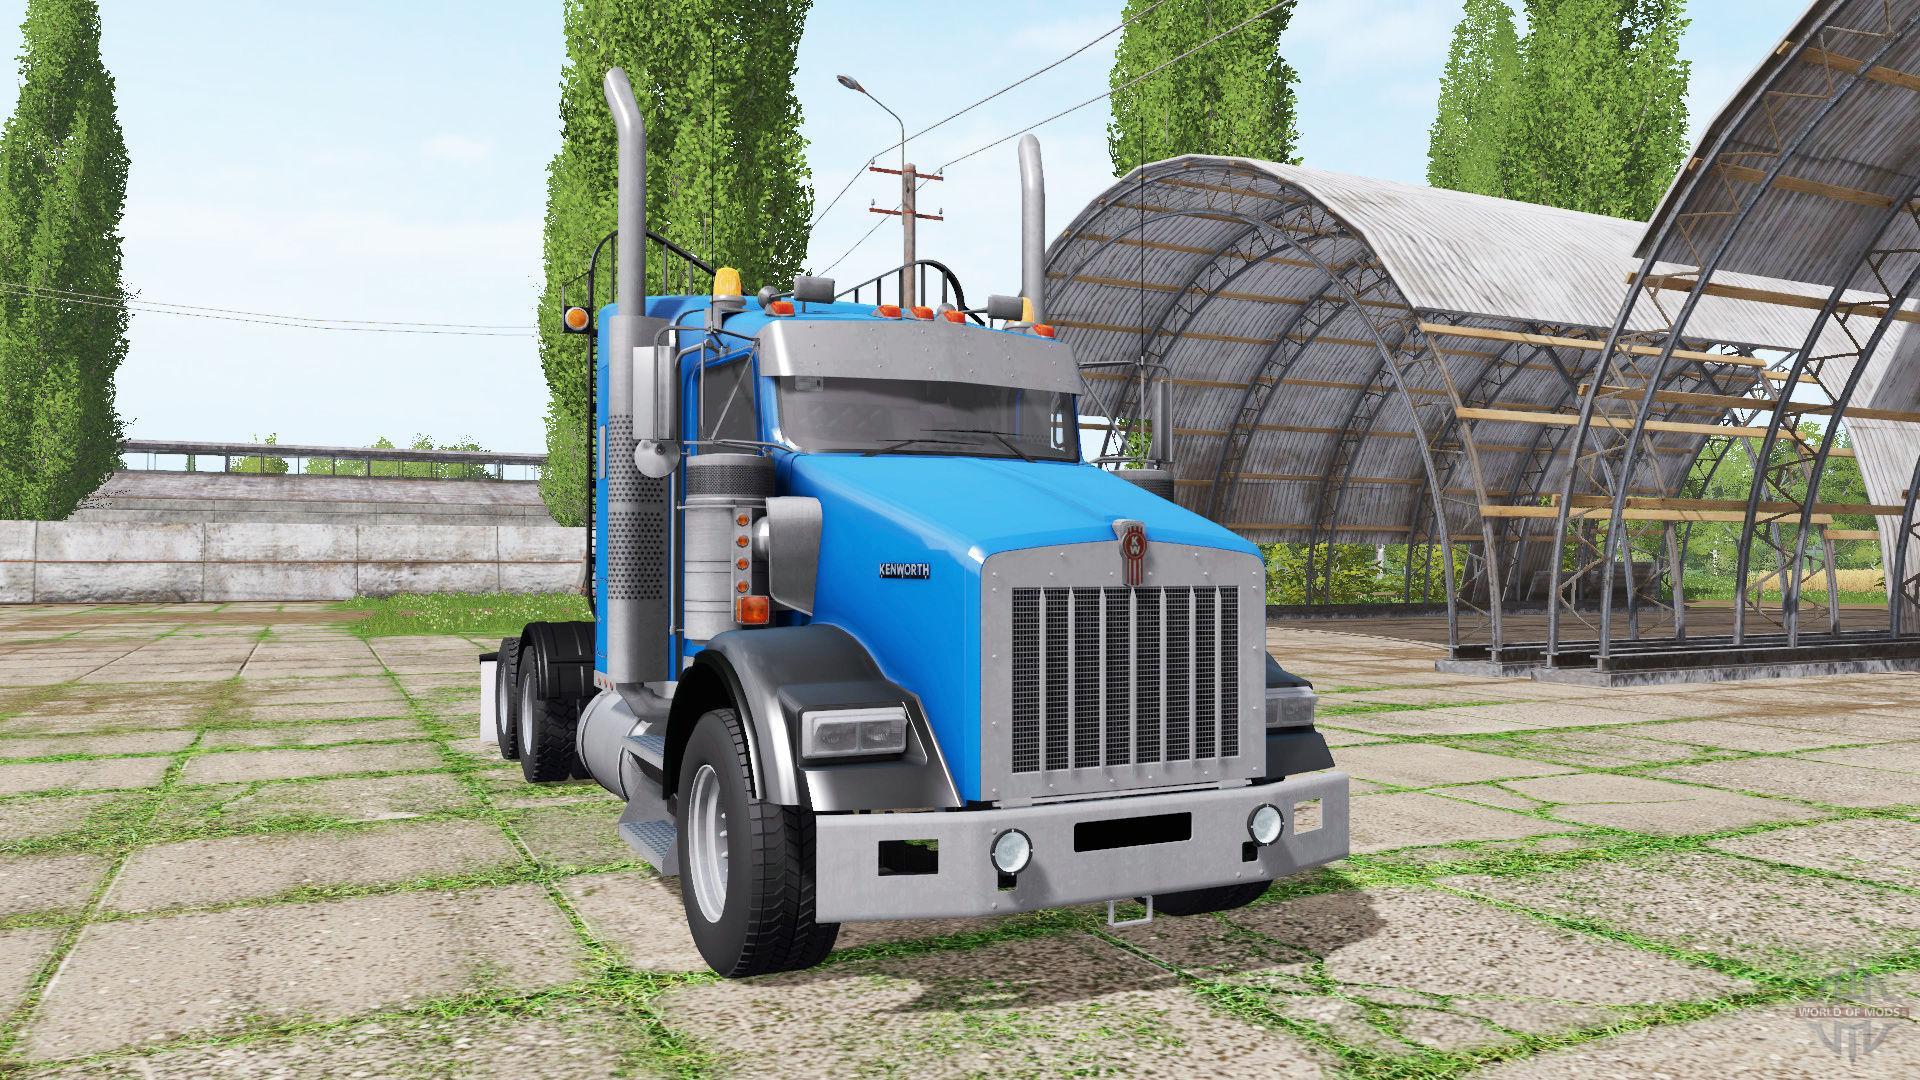 T800 » GamesMods.net - FS19, FS17, ETS 2 modsKenworth Dump Trucks Fs19